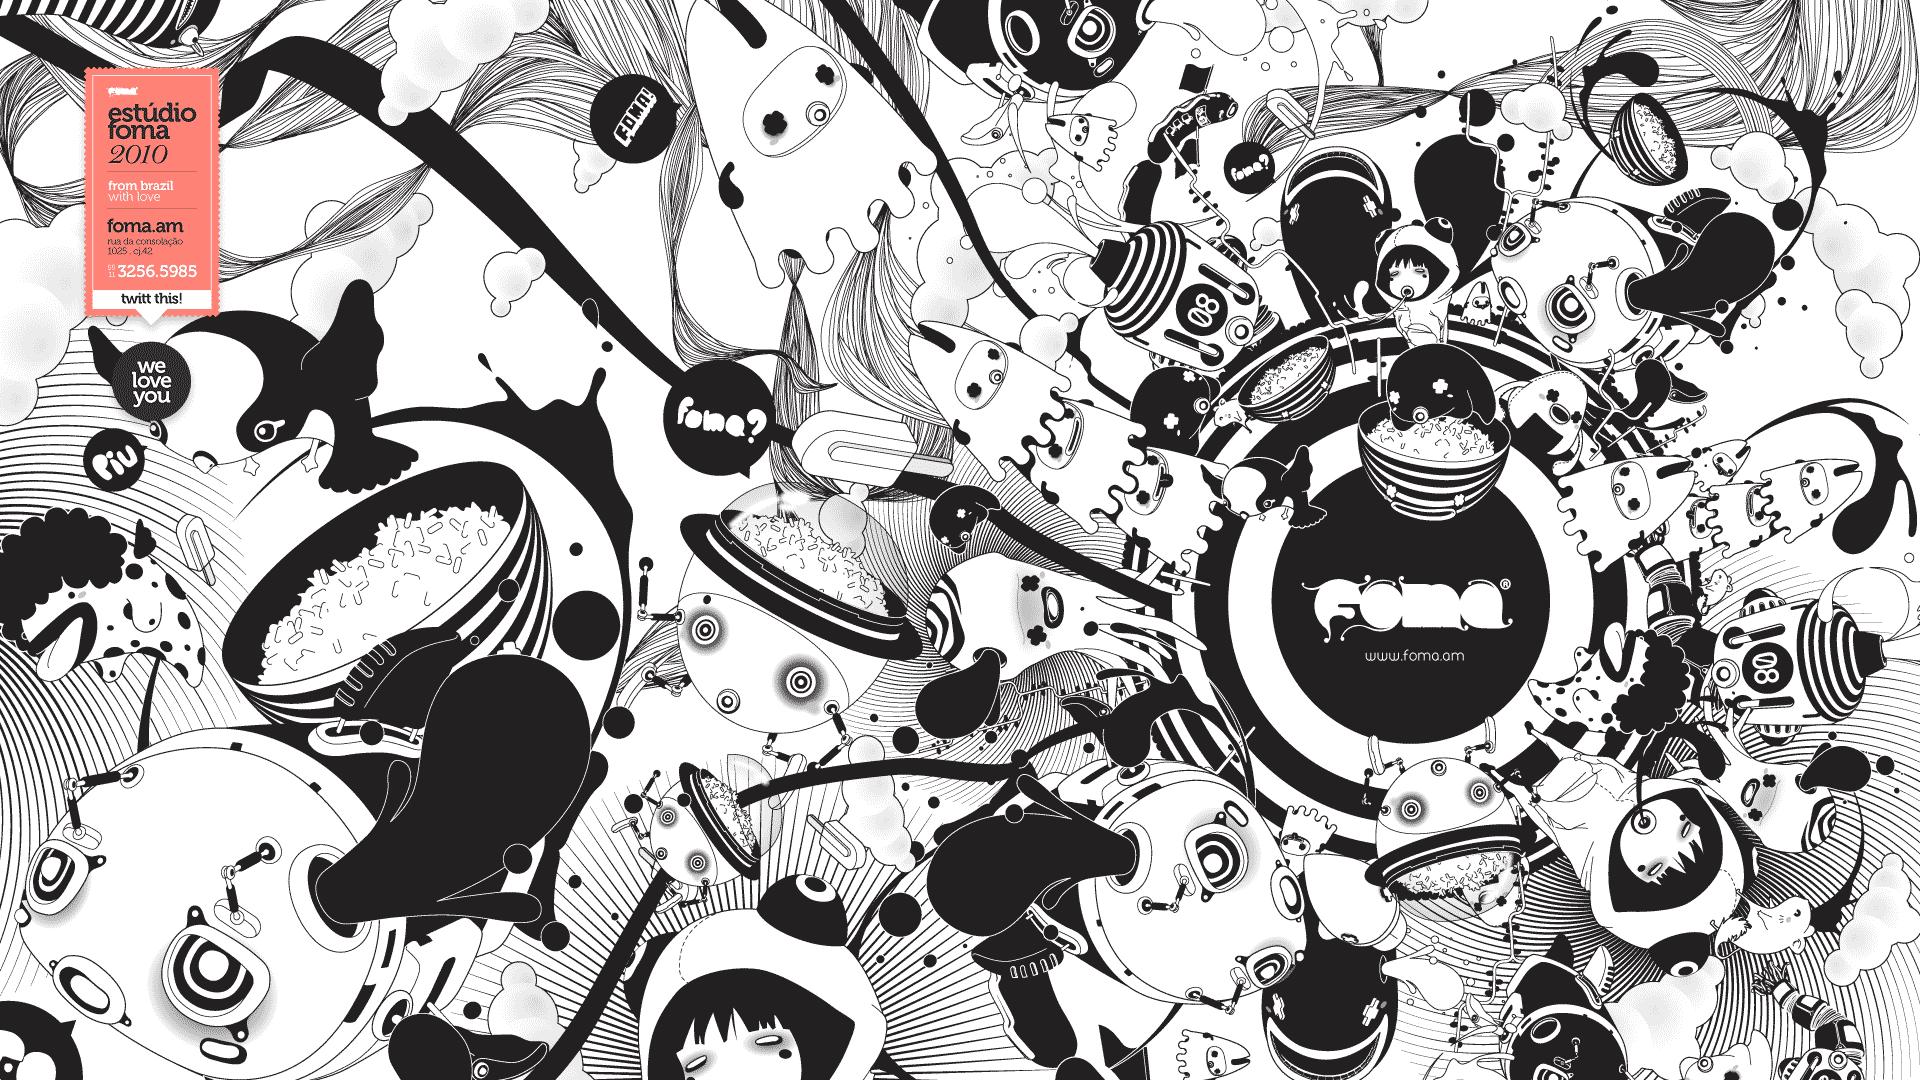 estudio_foma_2008_bg_illustration_by_dchan-d4xfovy